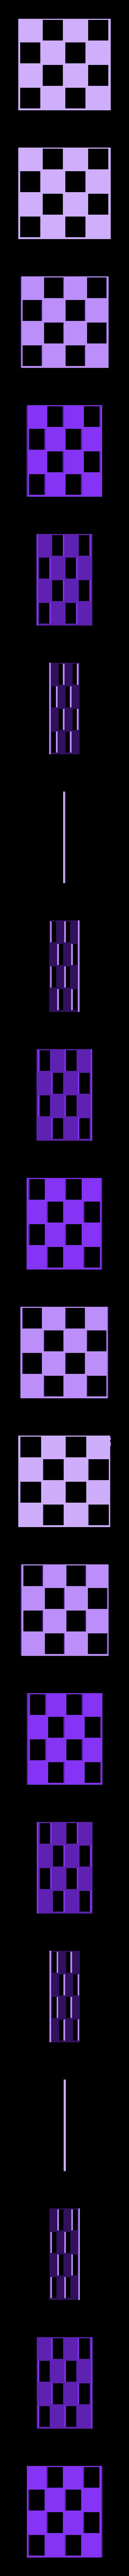 XYZ_chessboard.stl Download STL file Micro Planter Chess Set • 3D print template, XYZWorkshop